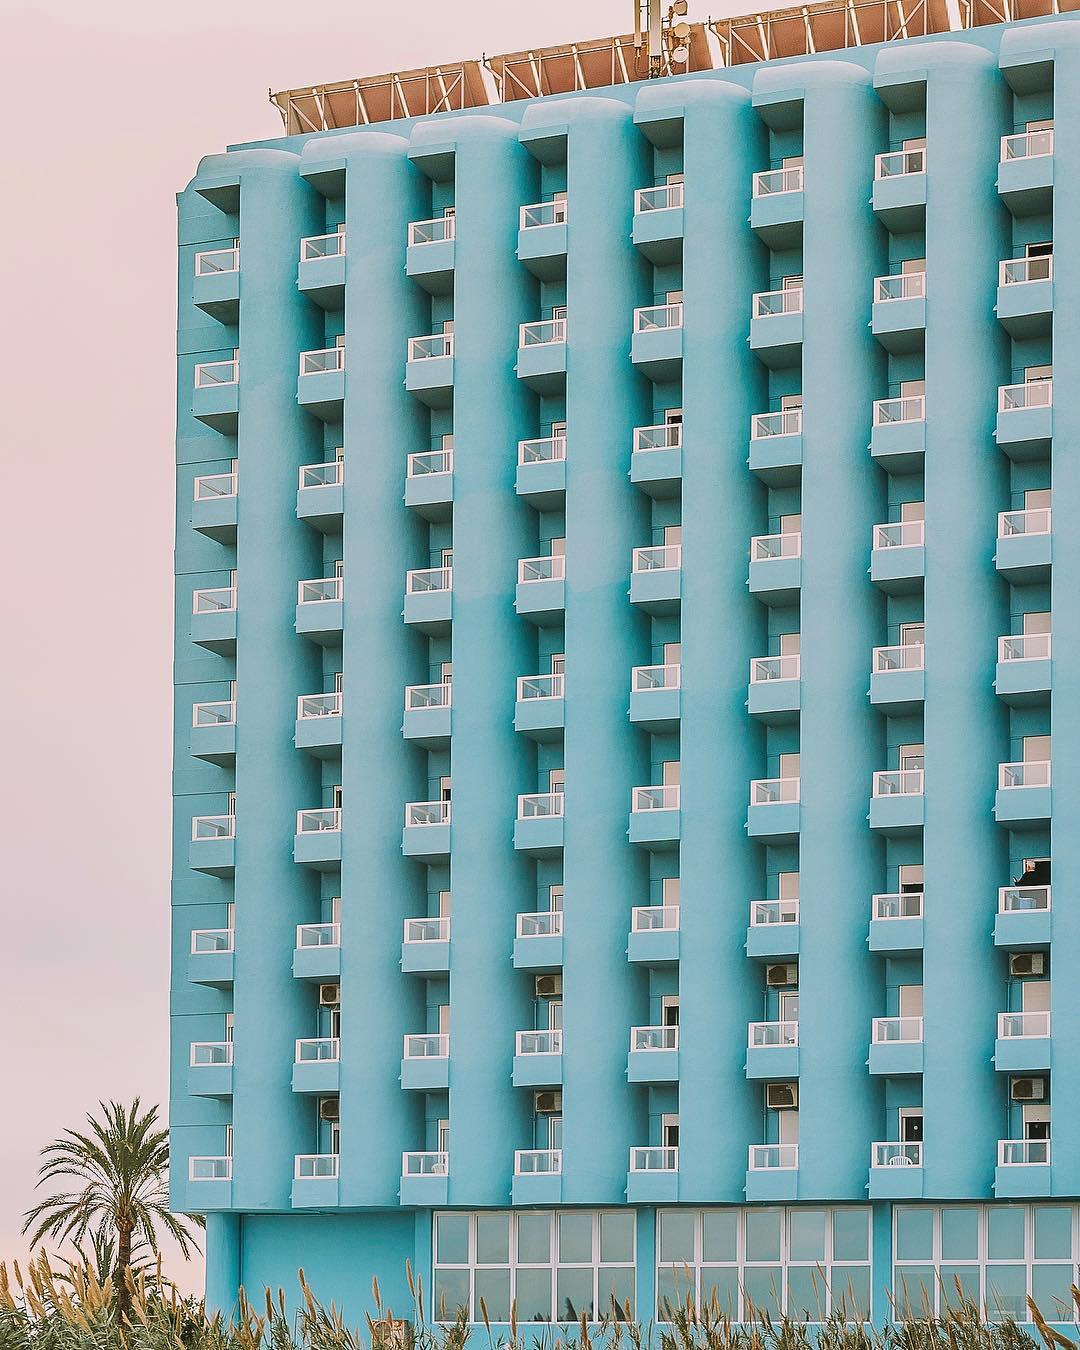 fotografo Joaquin Lucas paleta de colores de Wes Anderson  (22)